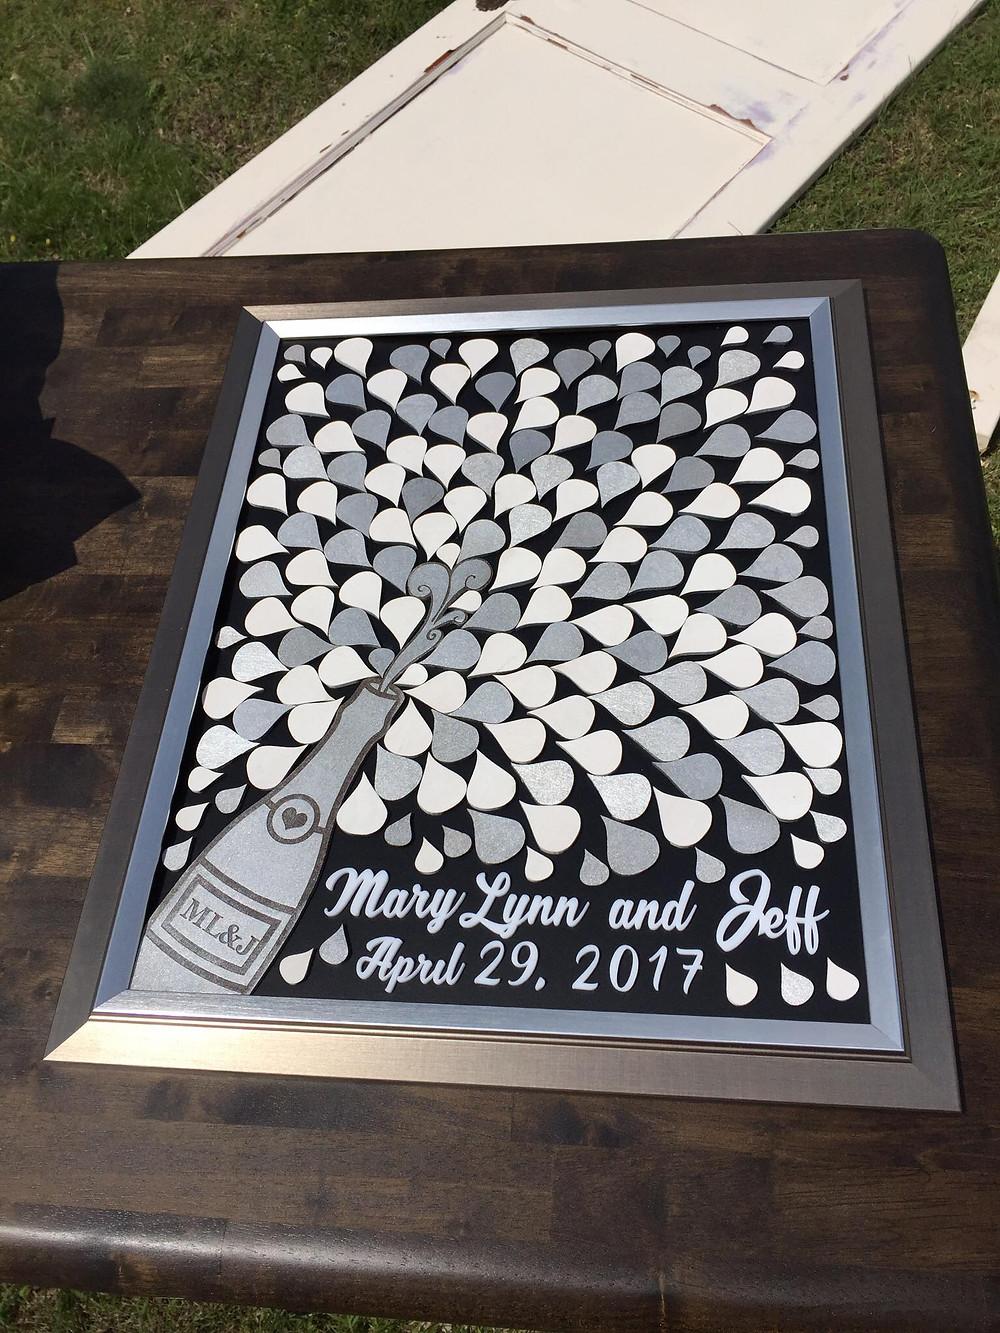 Wedding Guest Book - Champagne Bottle